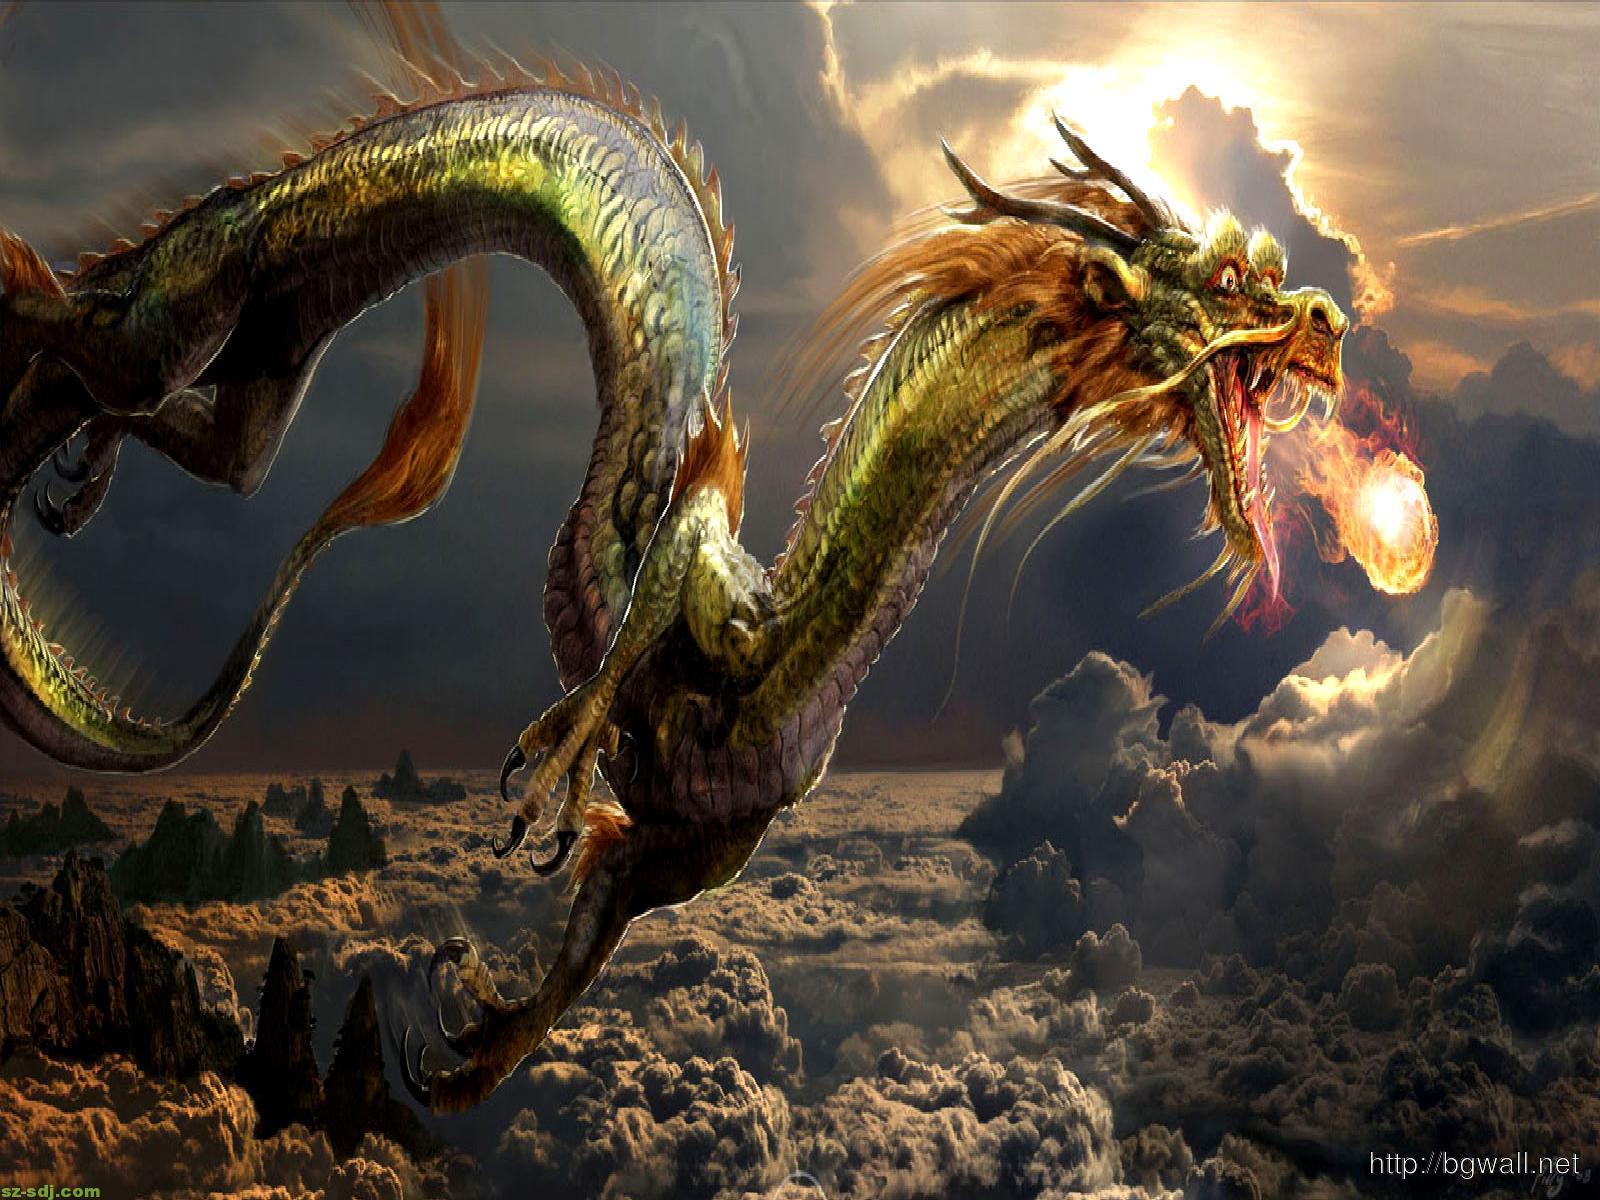 miscellaneous fire dragon picture - photo #13